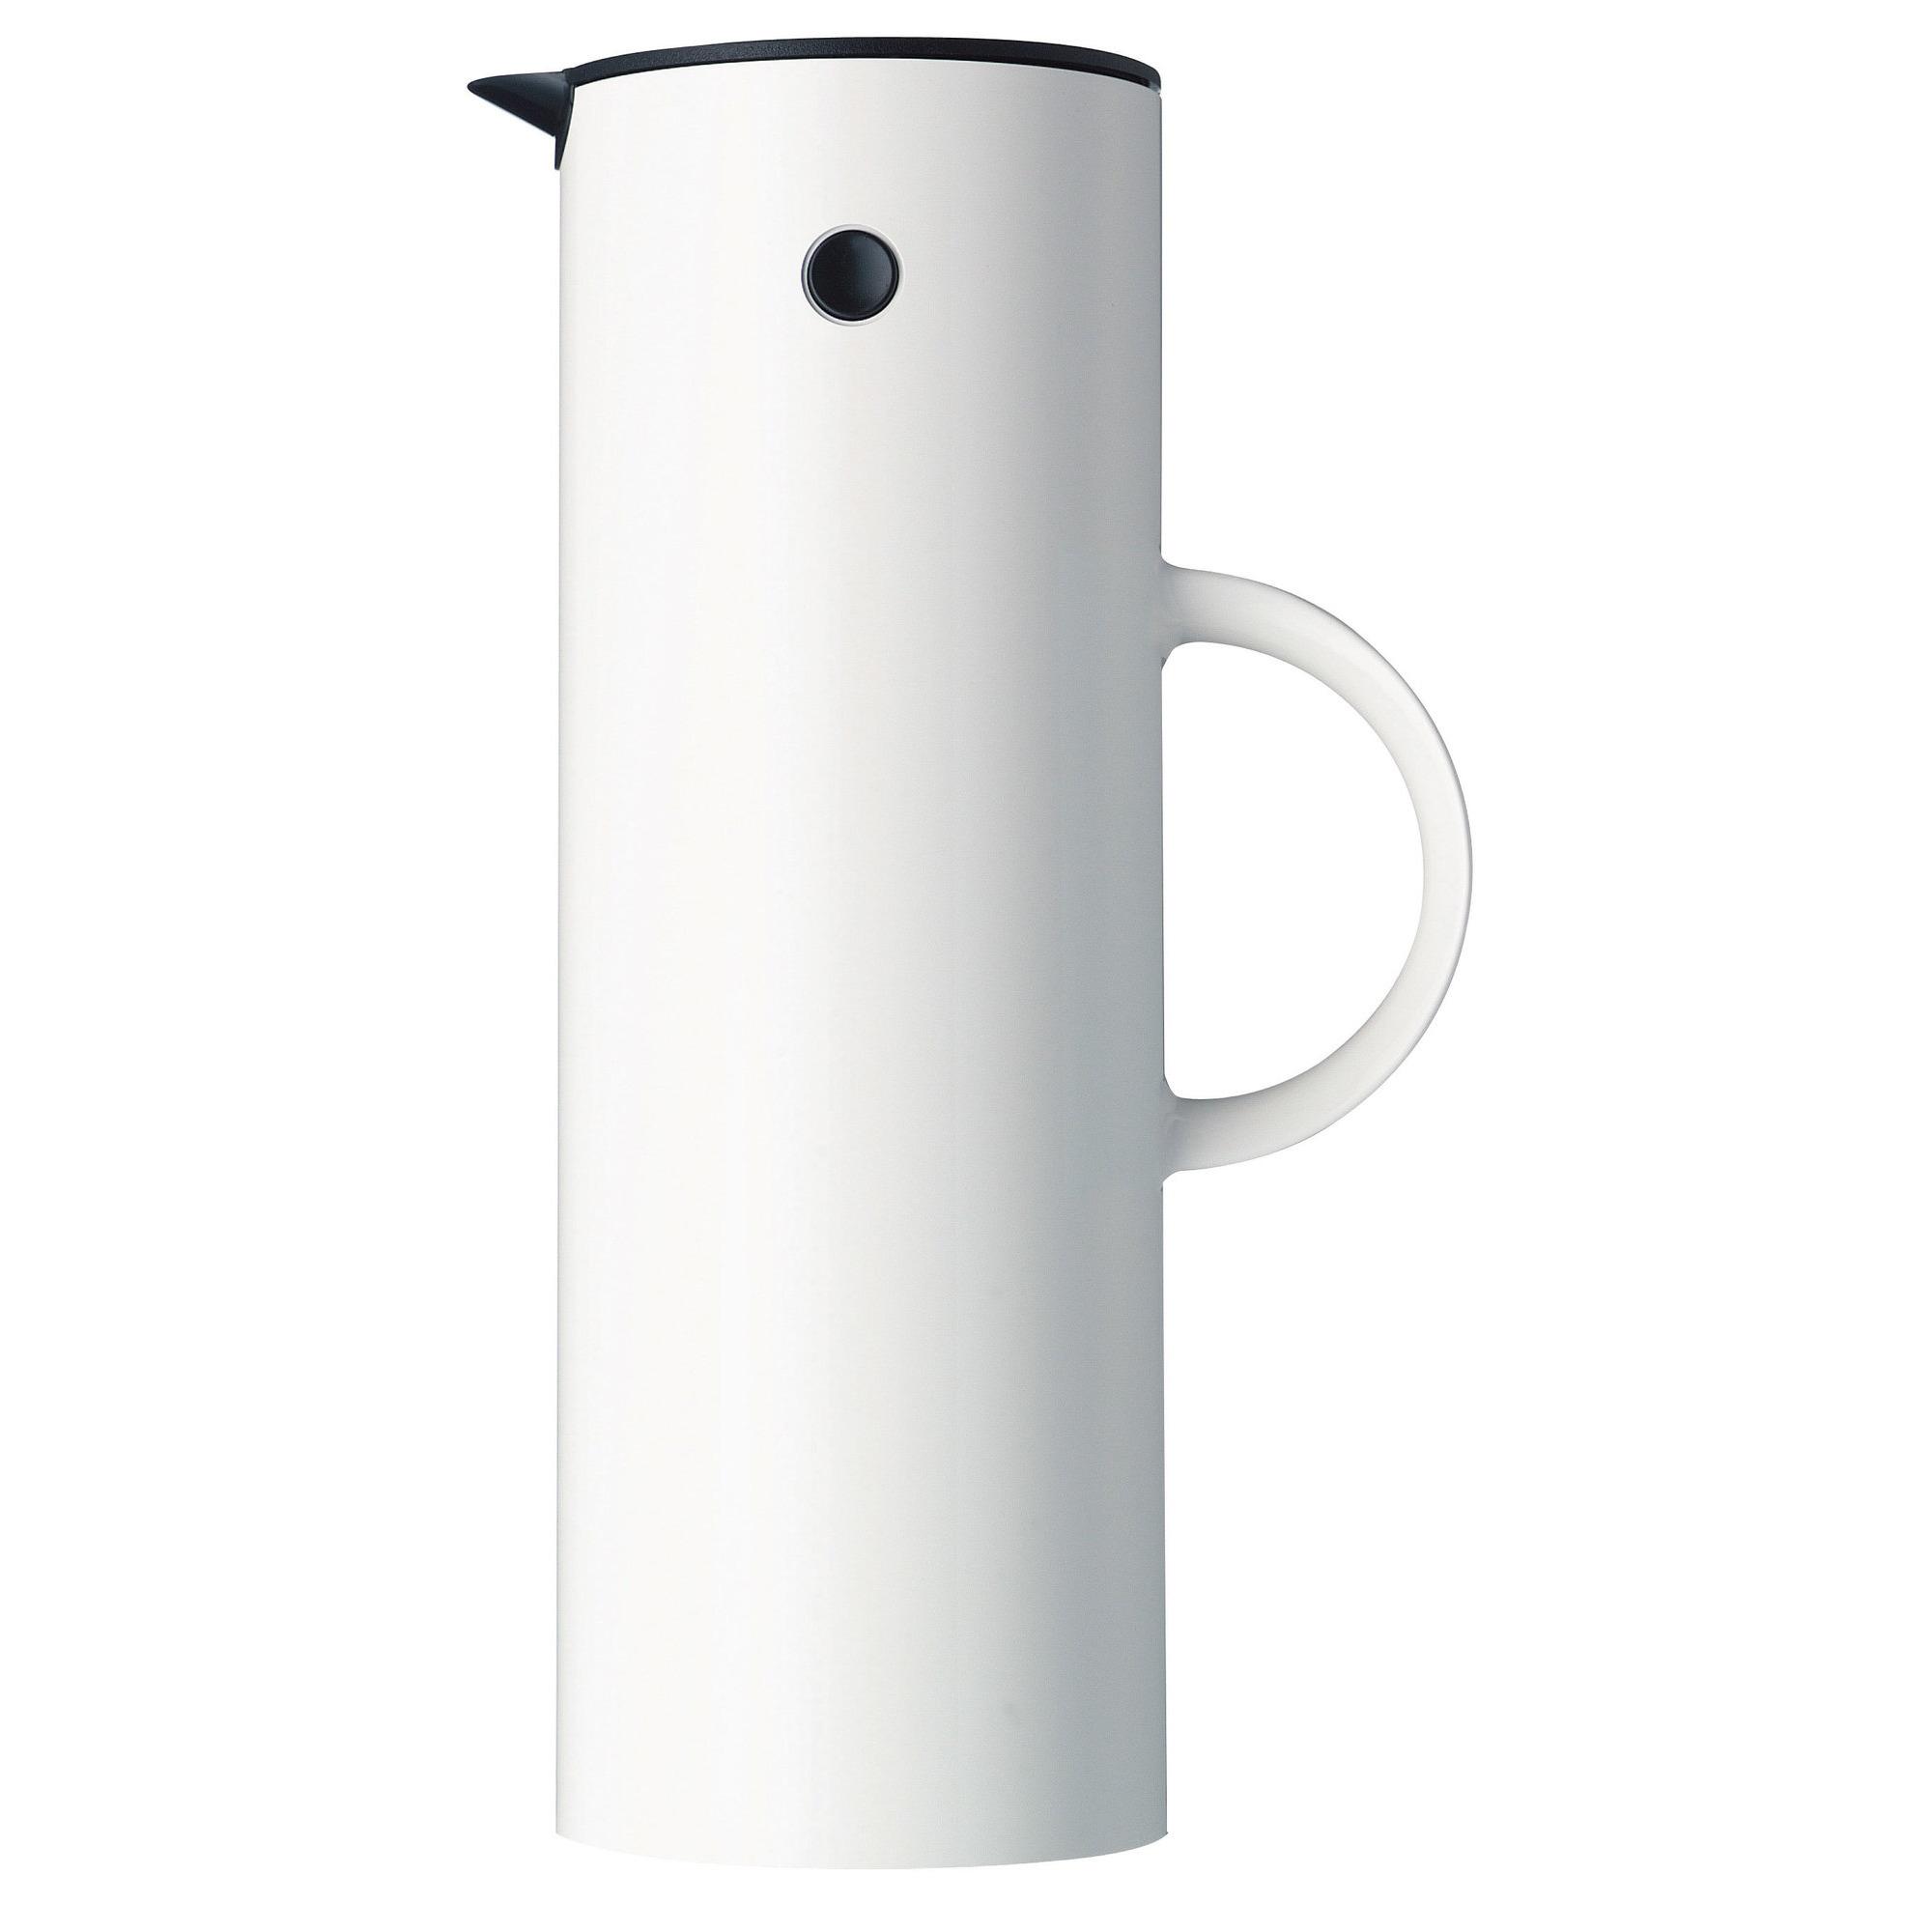 Stelton EM77 termoskanna 1 liter - ABS Vit